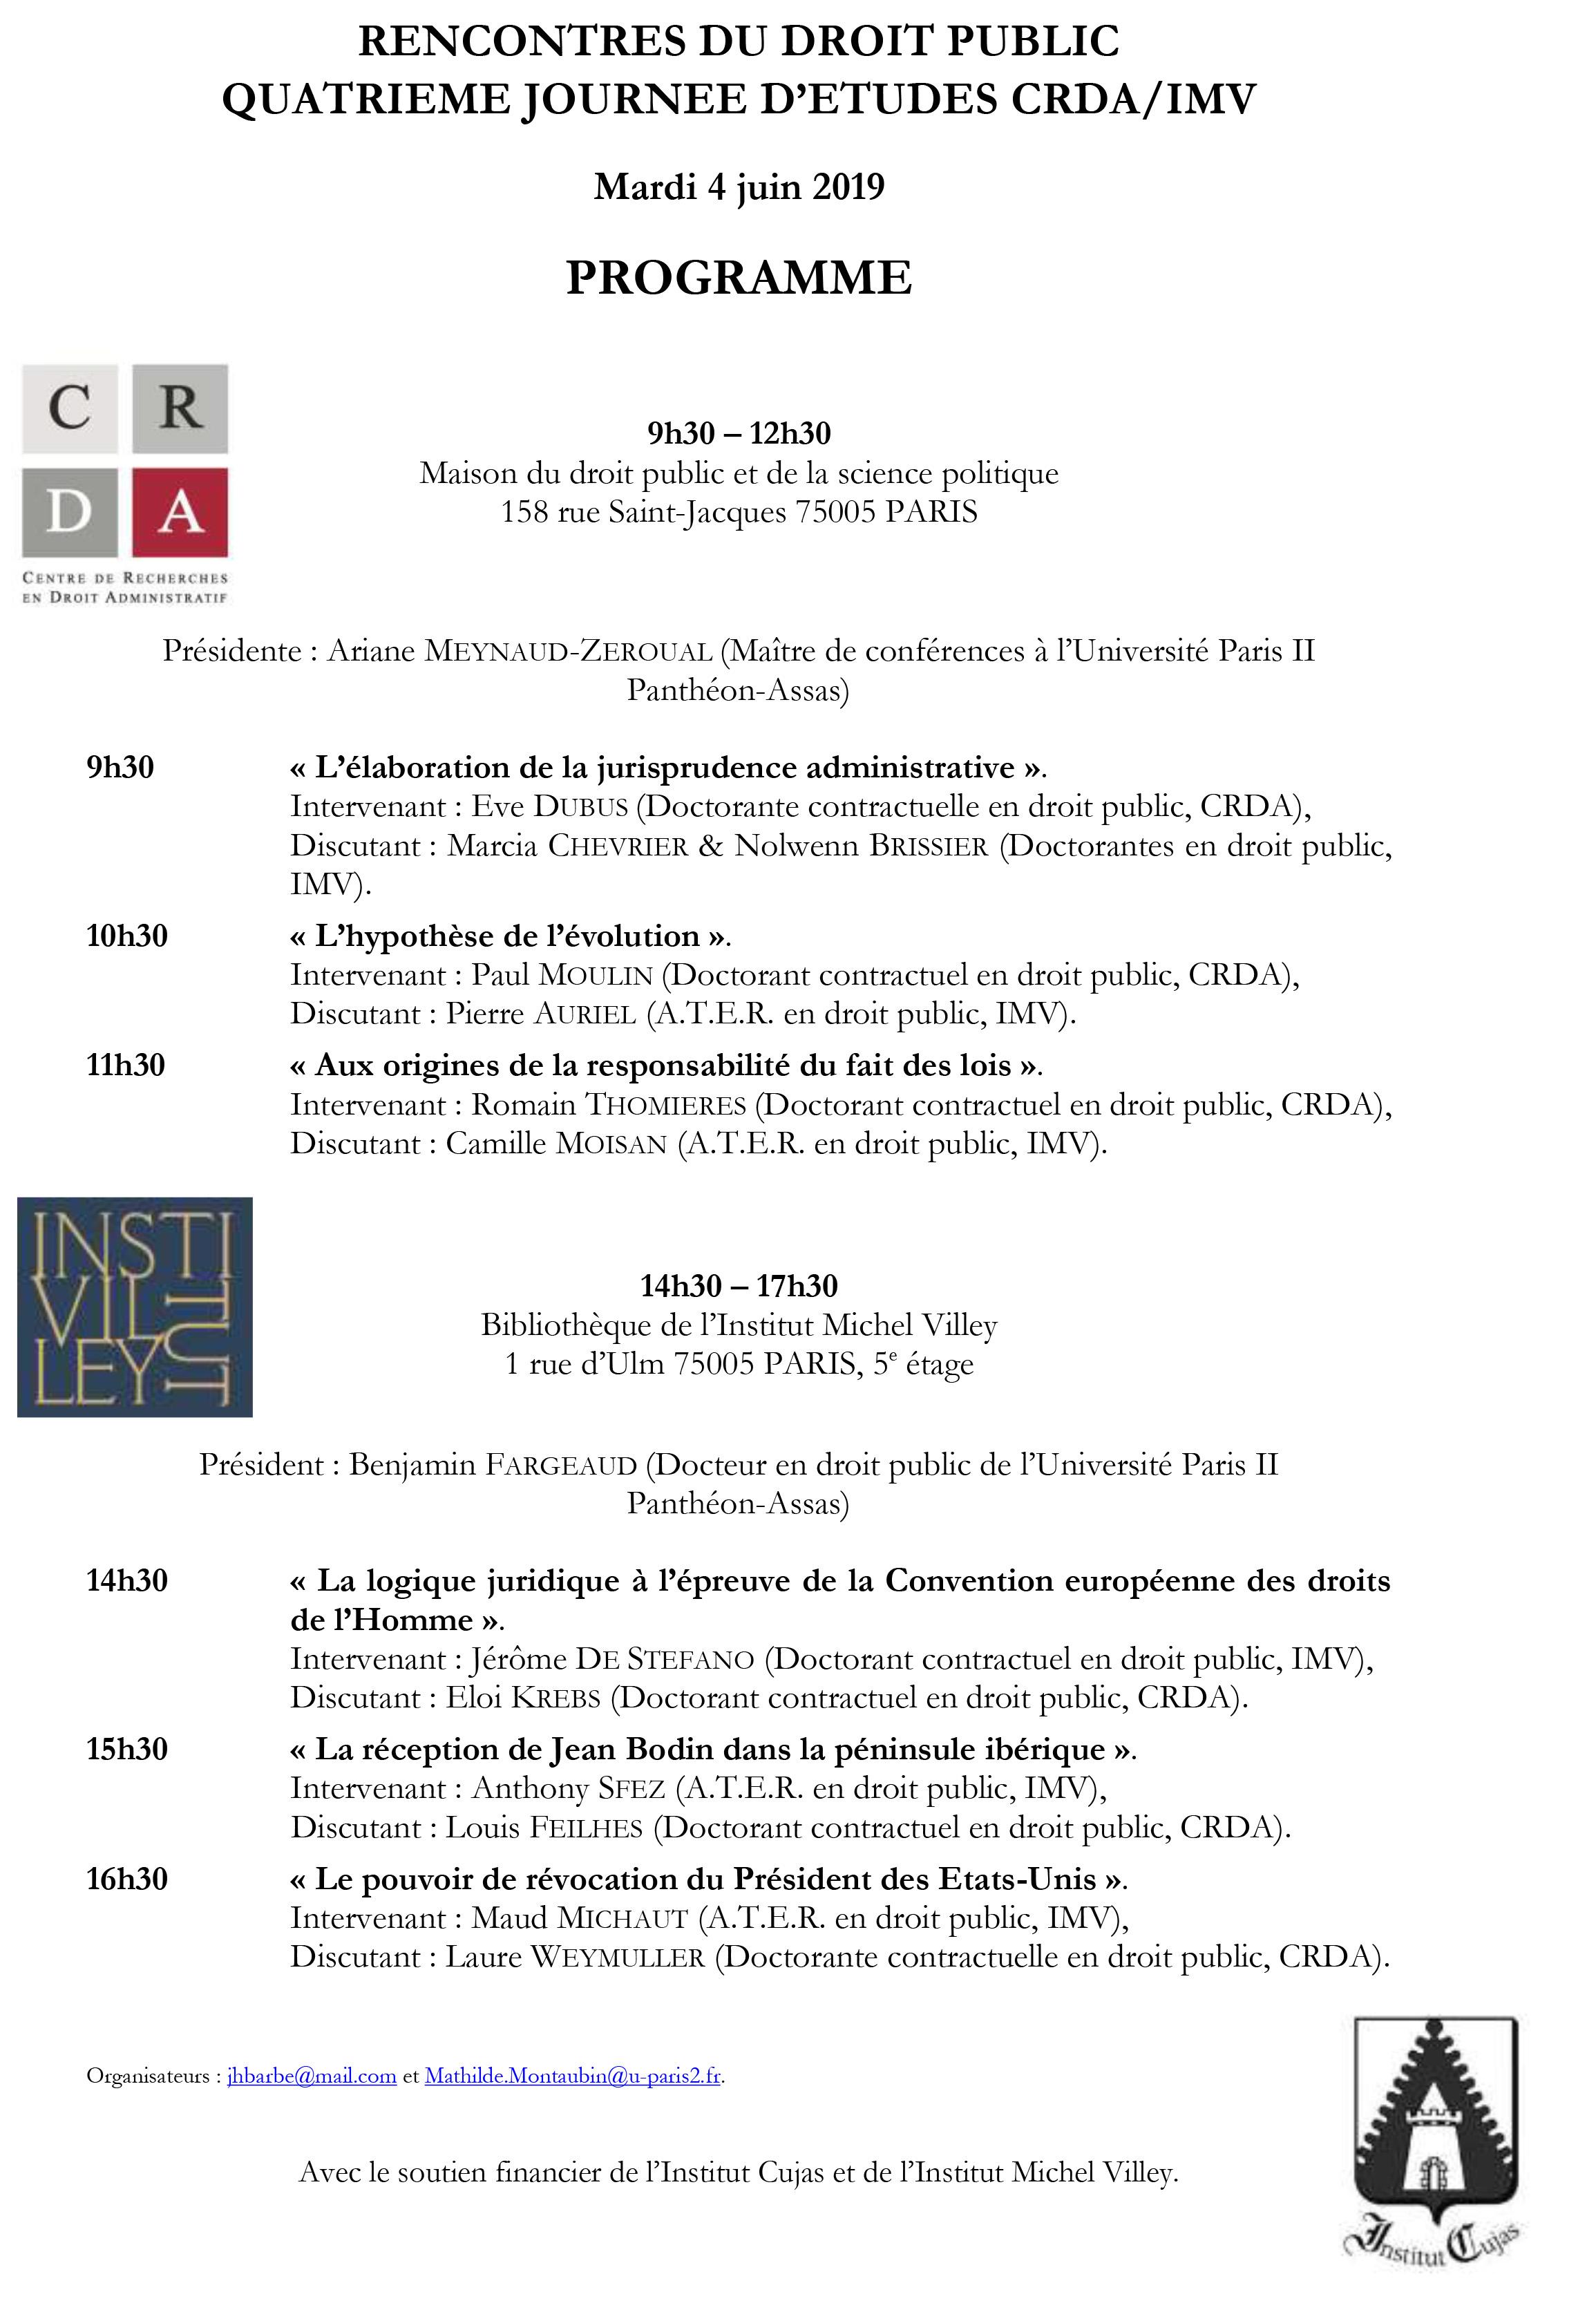 Programme rencontres IMV et CRDA